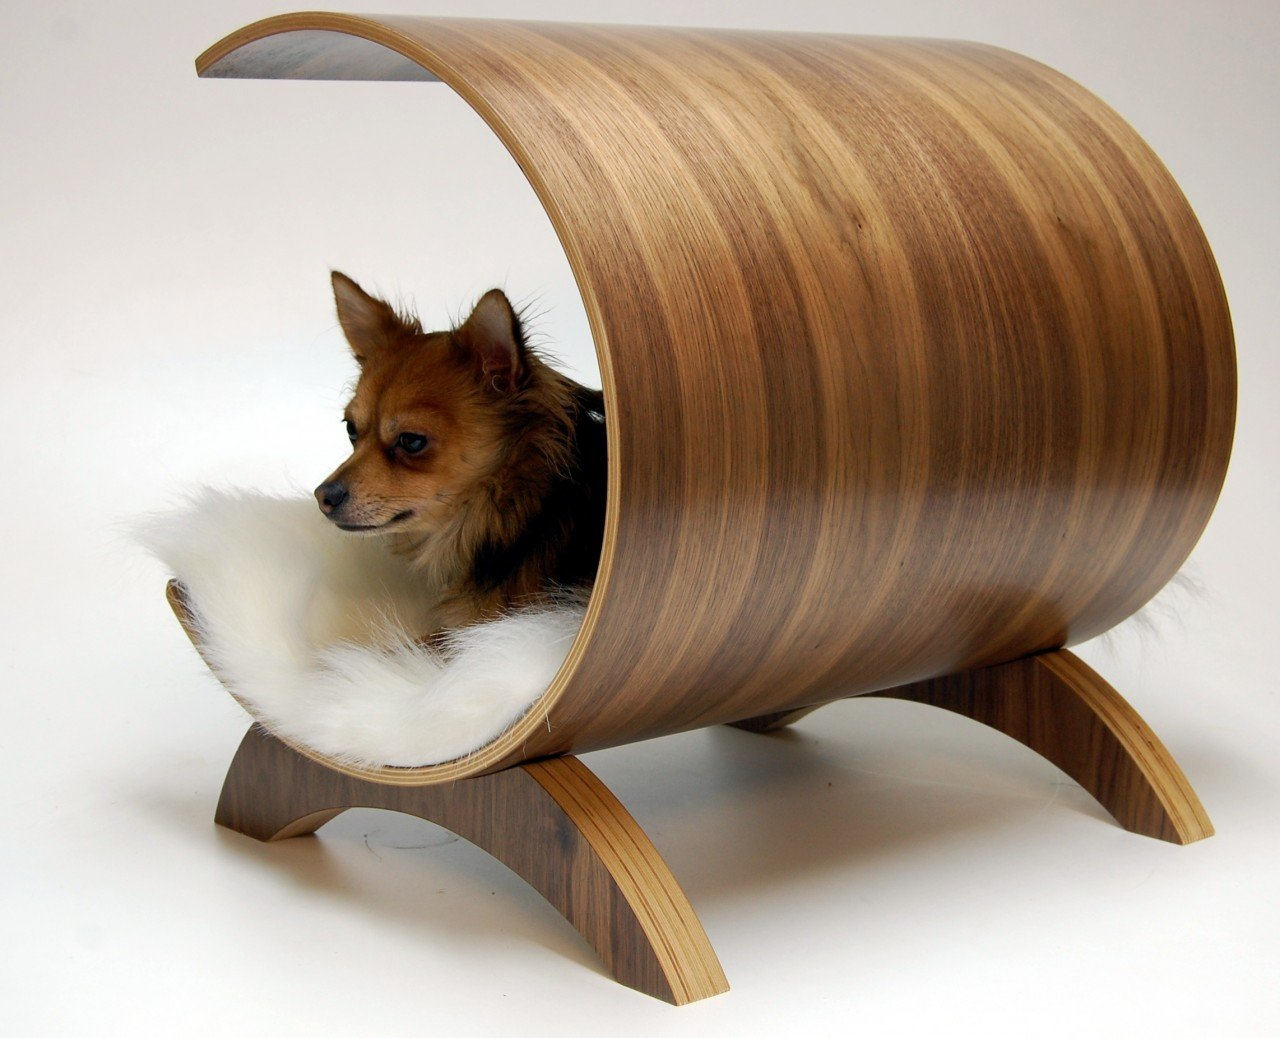 Elegantes camas para mascotas decoraci n del hogar for Accesorios para mascotas